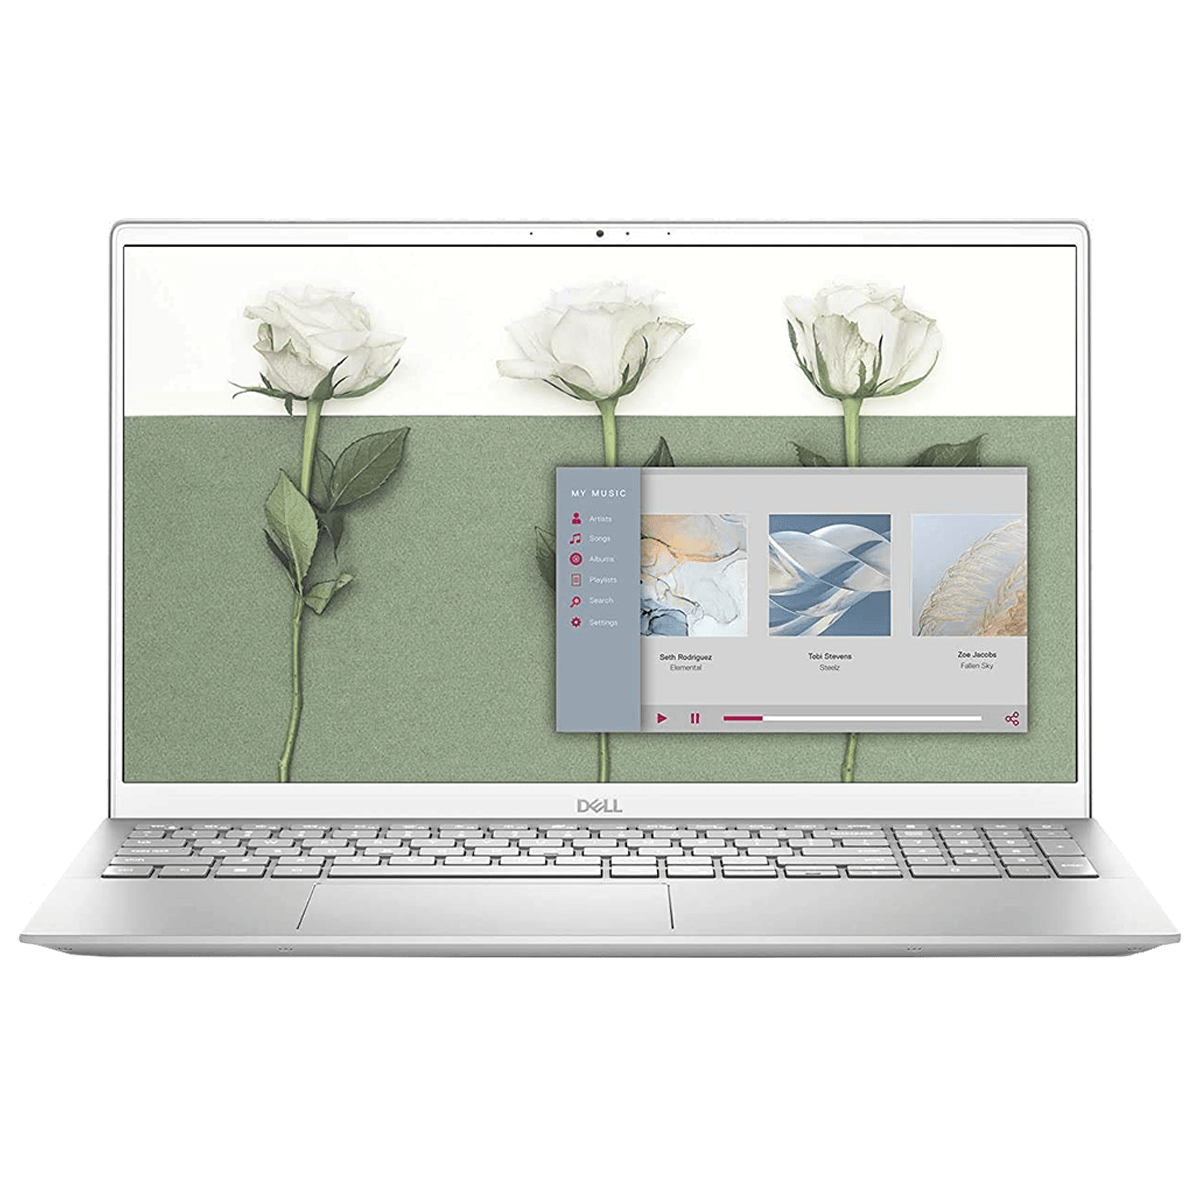 Dell Inspiron 5502 (D560364WIN9S) Core i5 11th Gen Windows 10 Laptop (8GB RAM, 512GB SSD, NVIDIA GeForce MX330 + 2 GB Graphics, MS Office, 39.62cm, Platinum Silver)